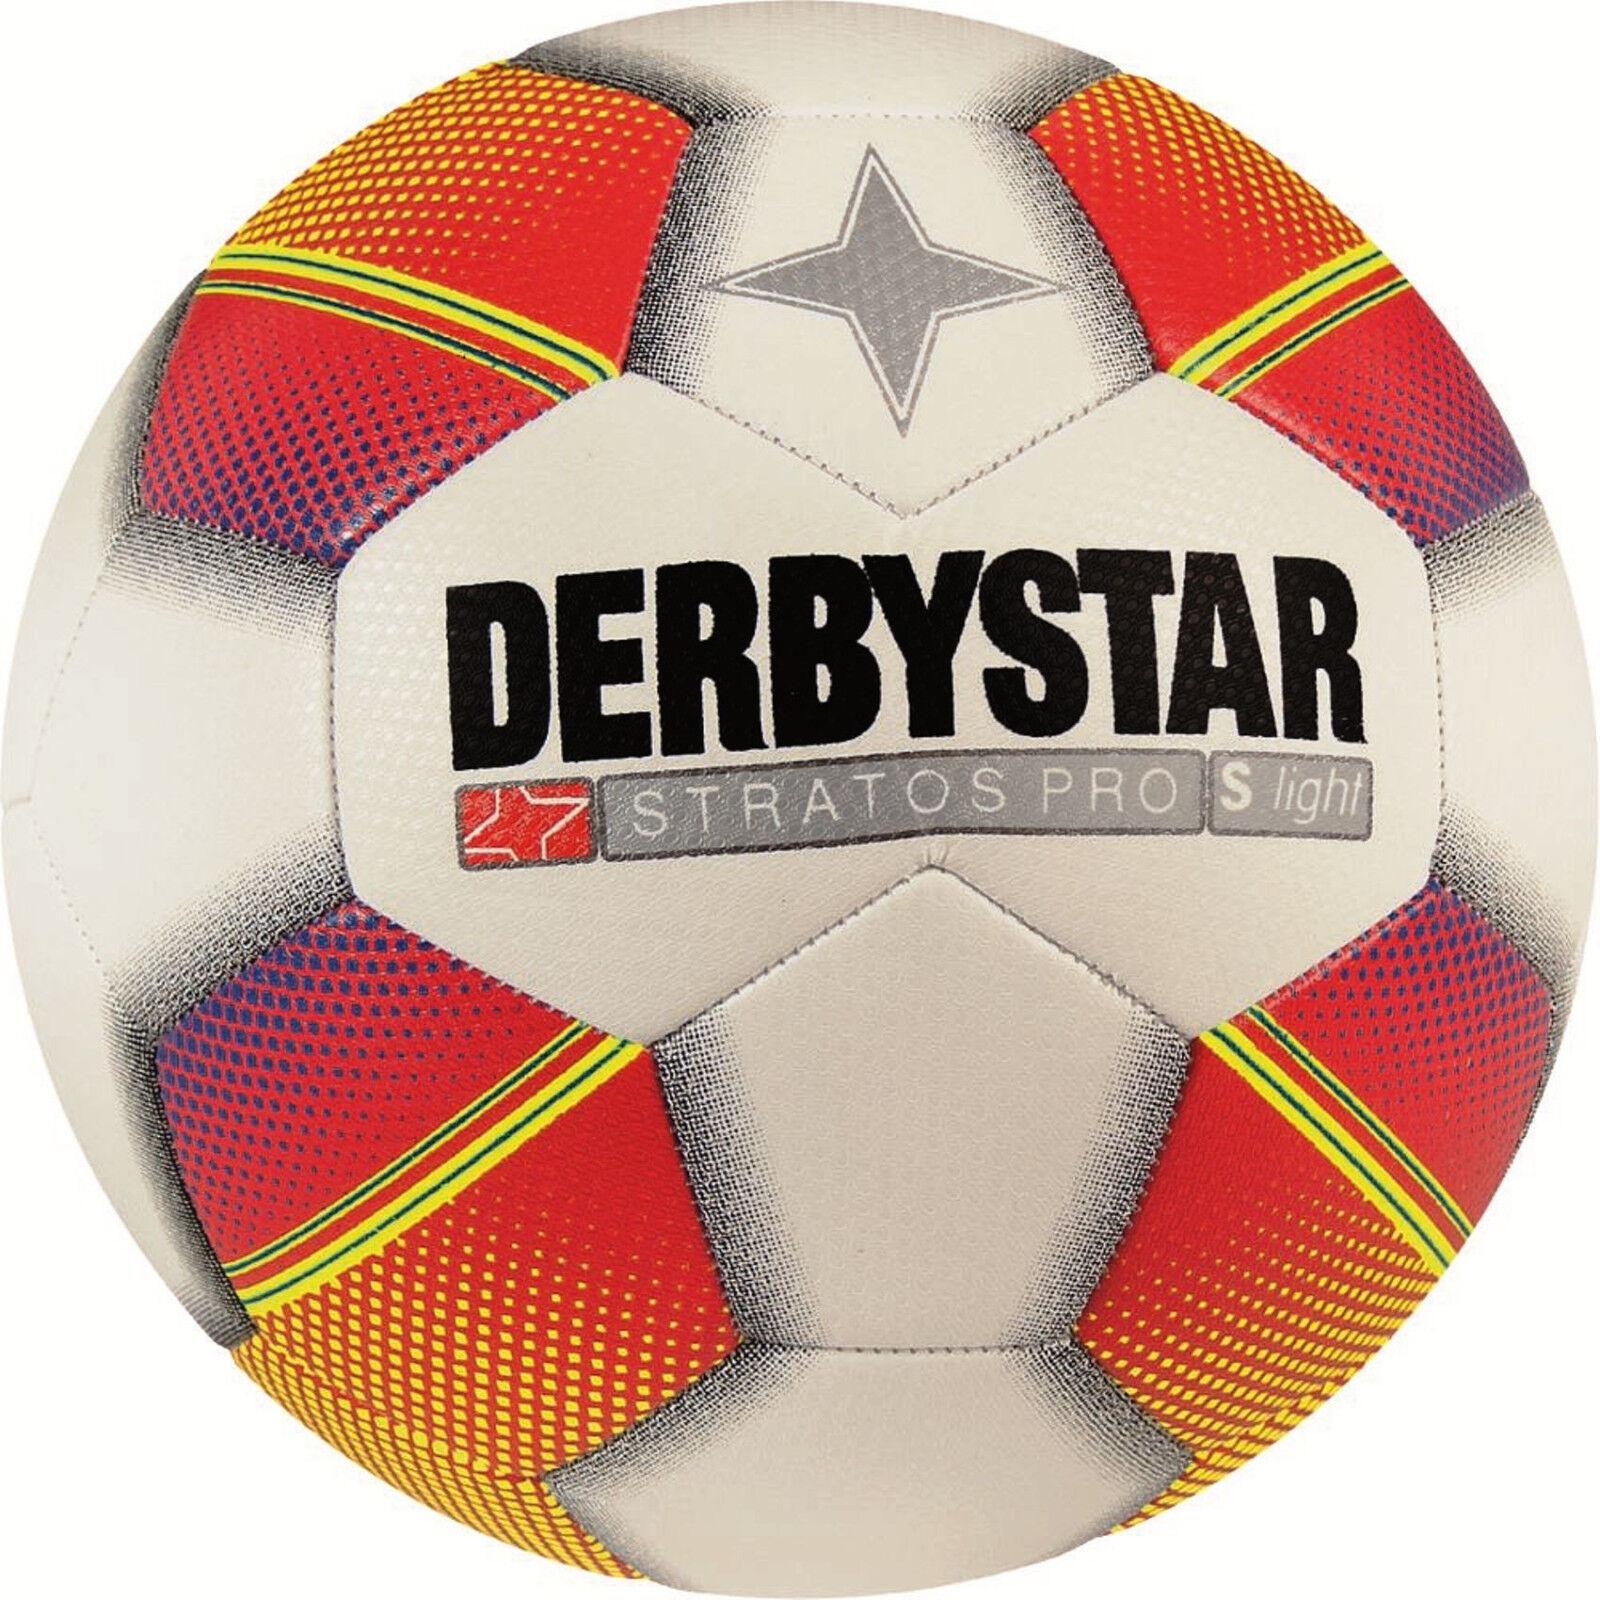 Ballpaket 10x Derbystar Jugendfußball Stratos PRO S-Light ca. 290g Größe 3